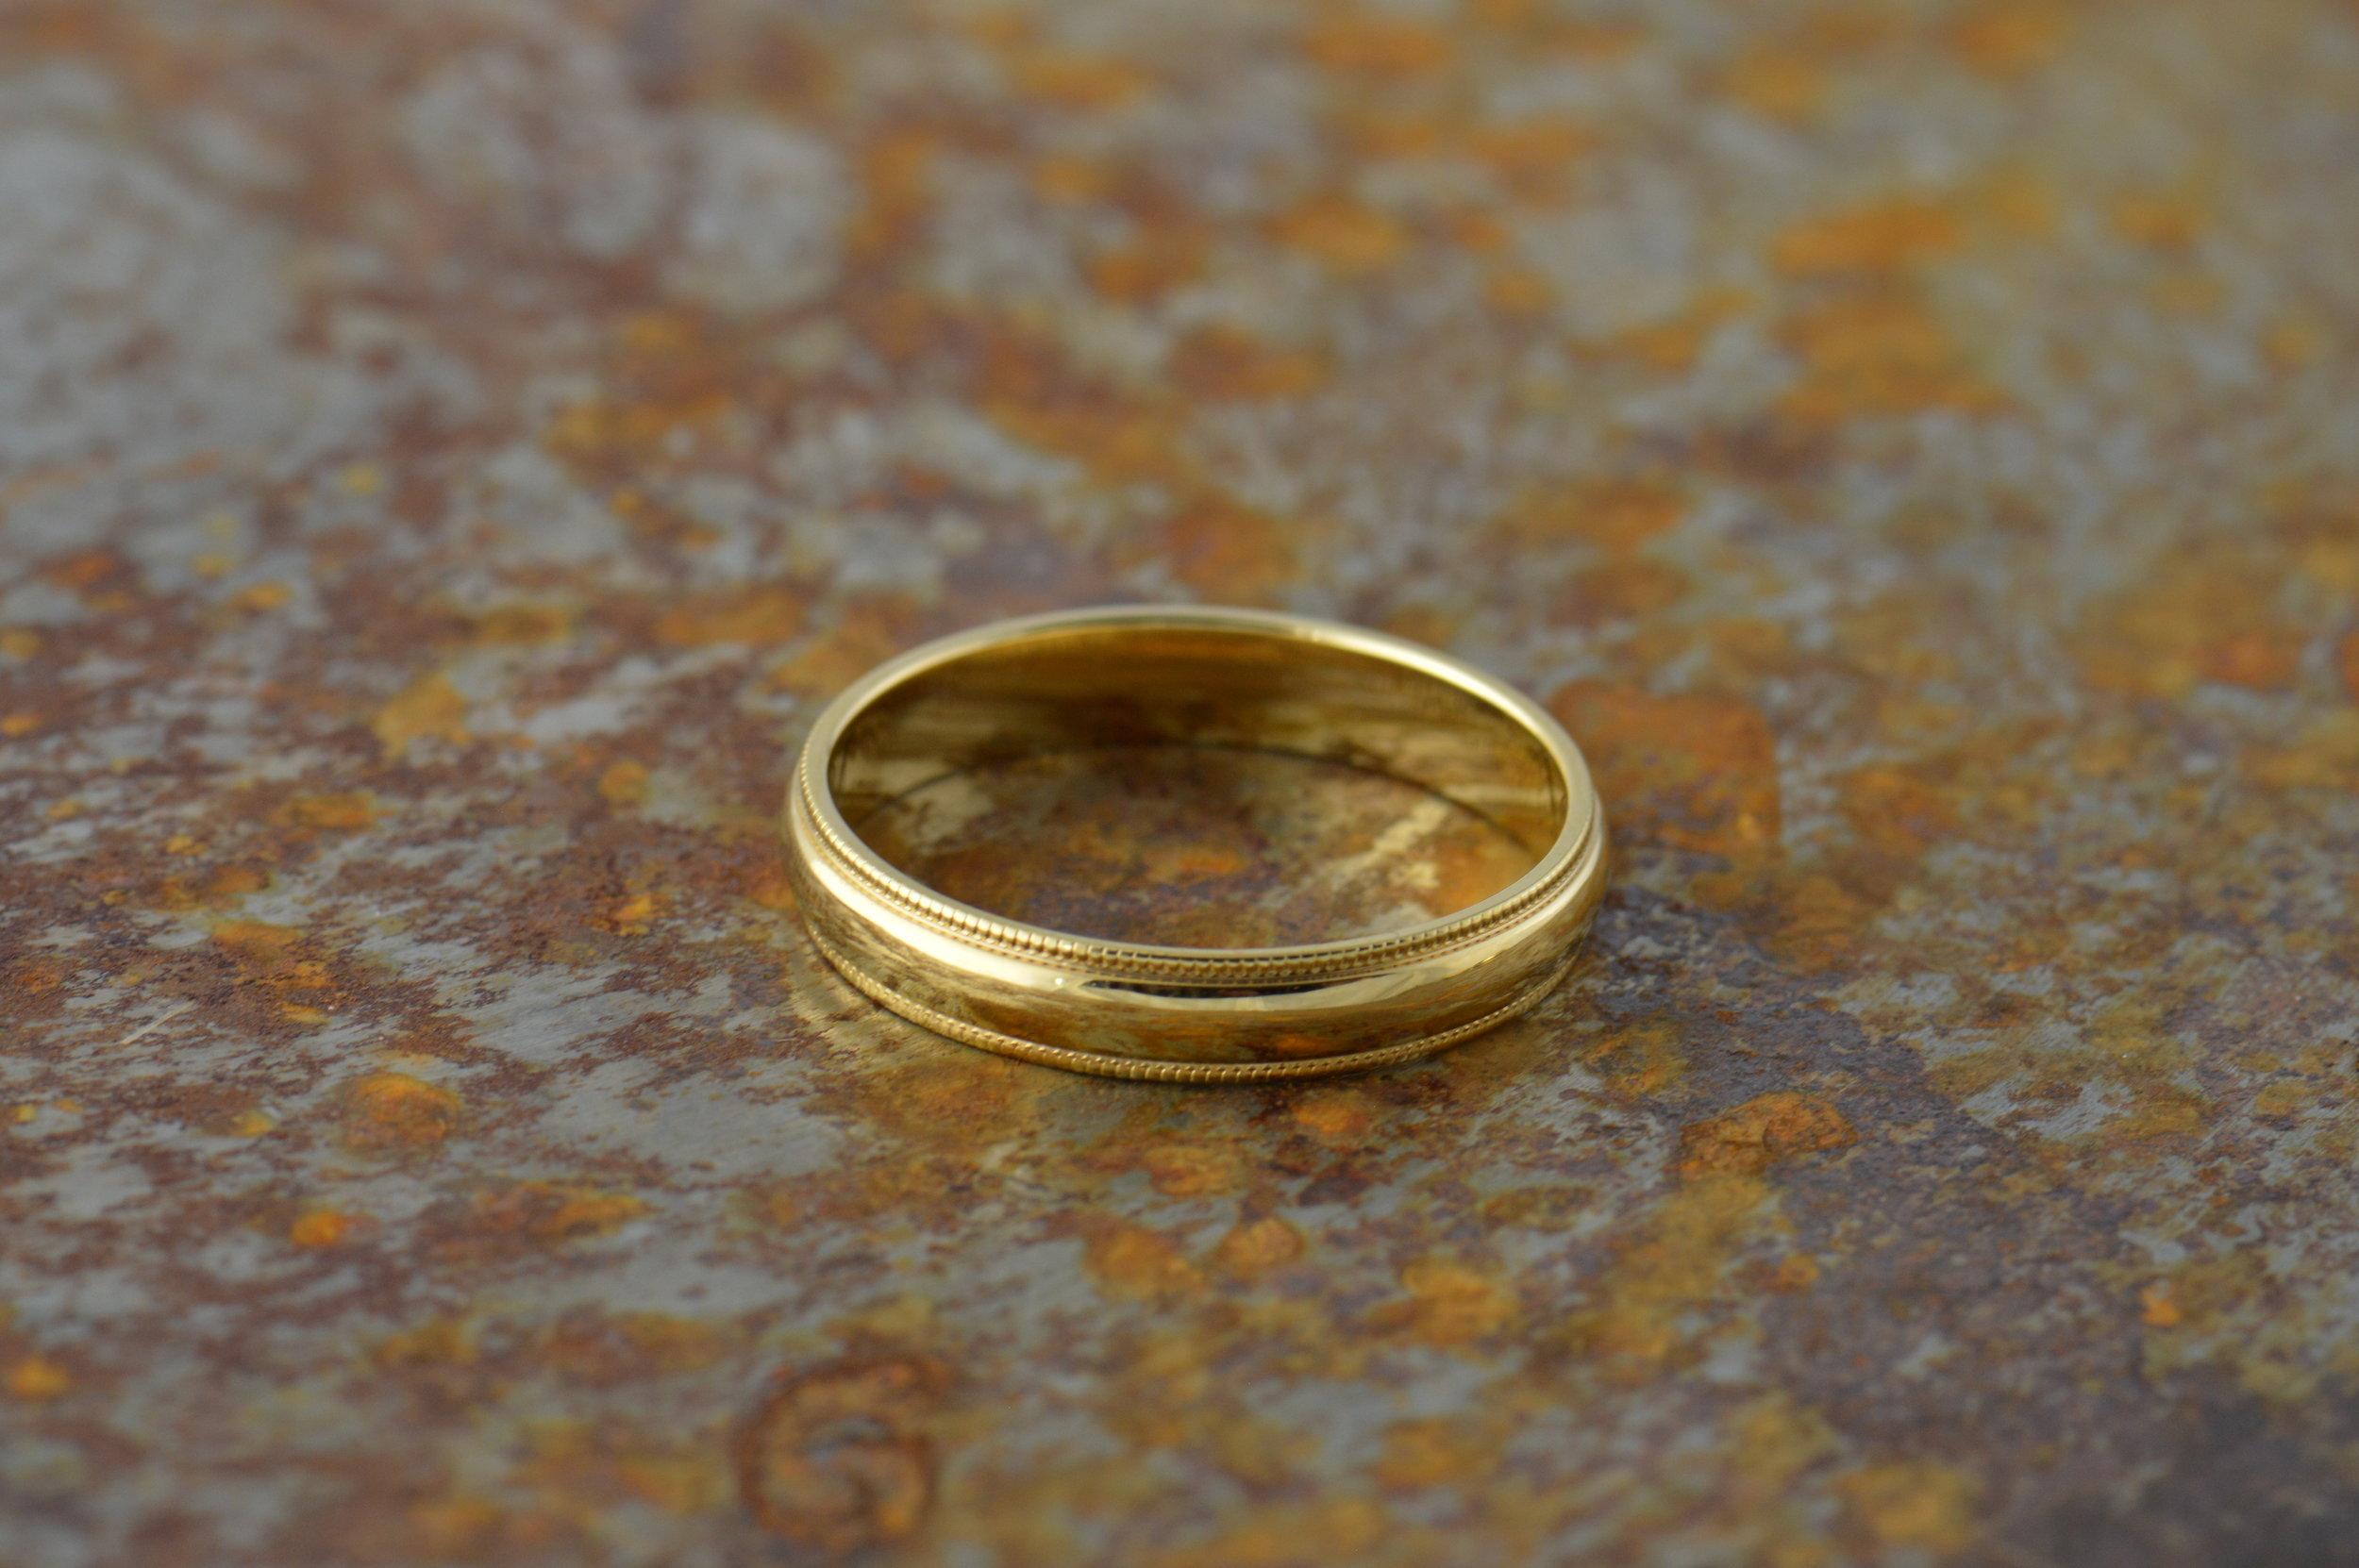 darvier-classic-millgrain-14k-yellow-gold-wedding-band.JPG